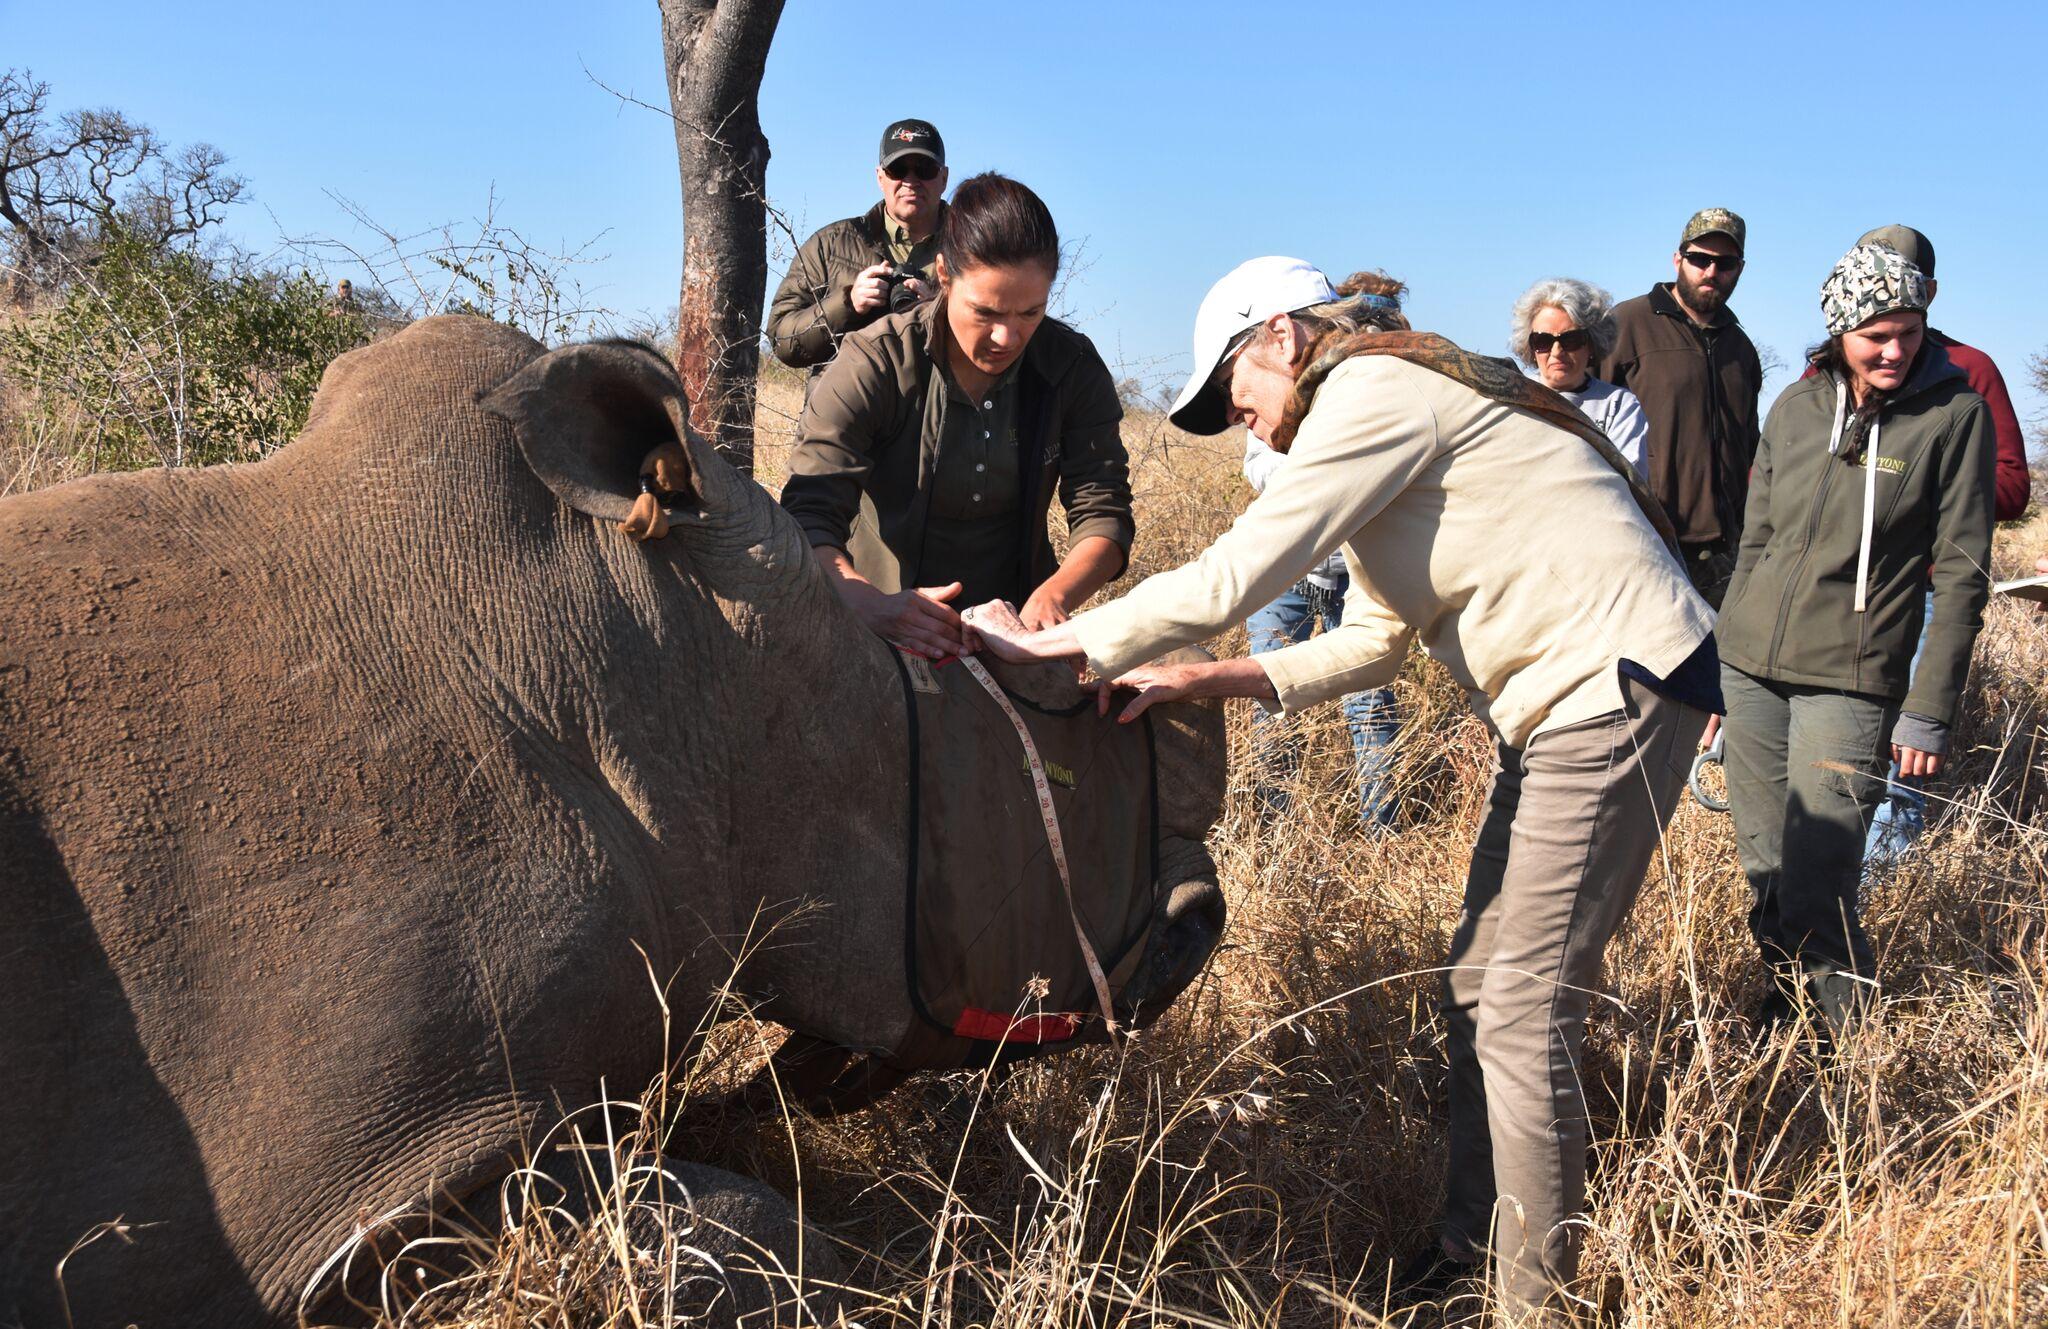 barb-with-karen-measuring-rhino-horn-before-dehorning-great